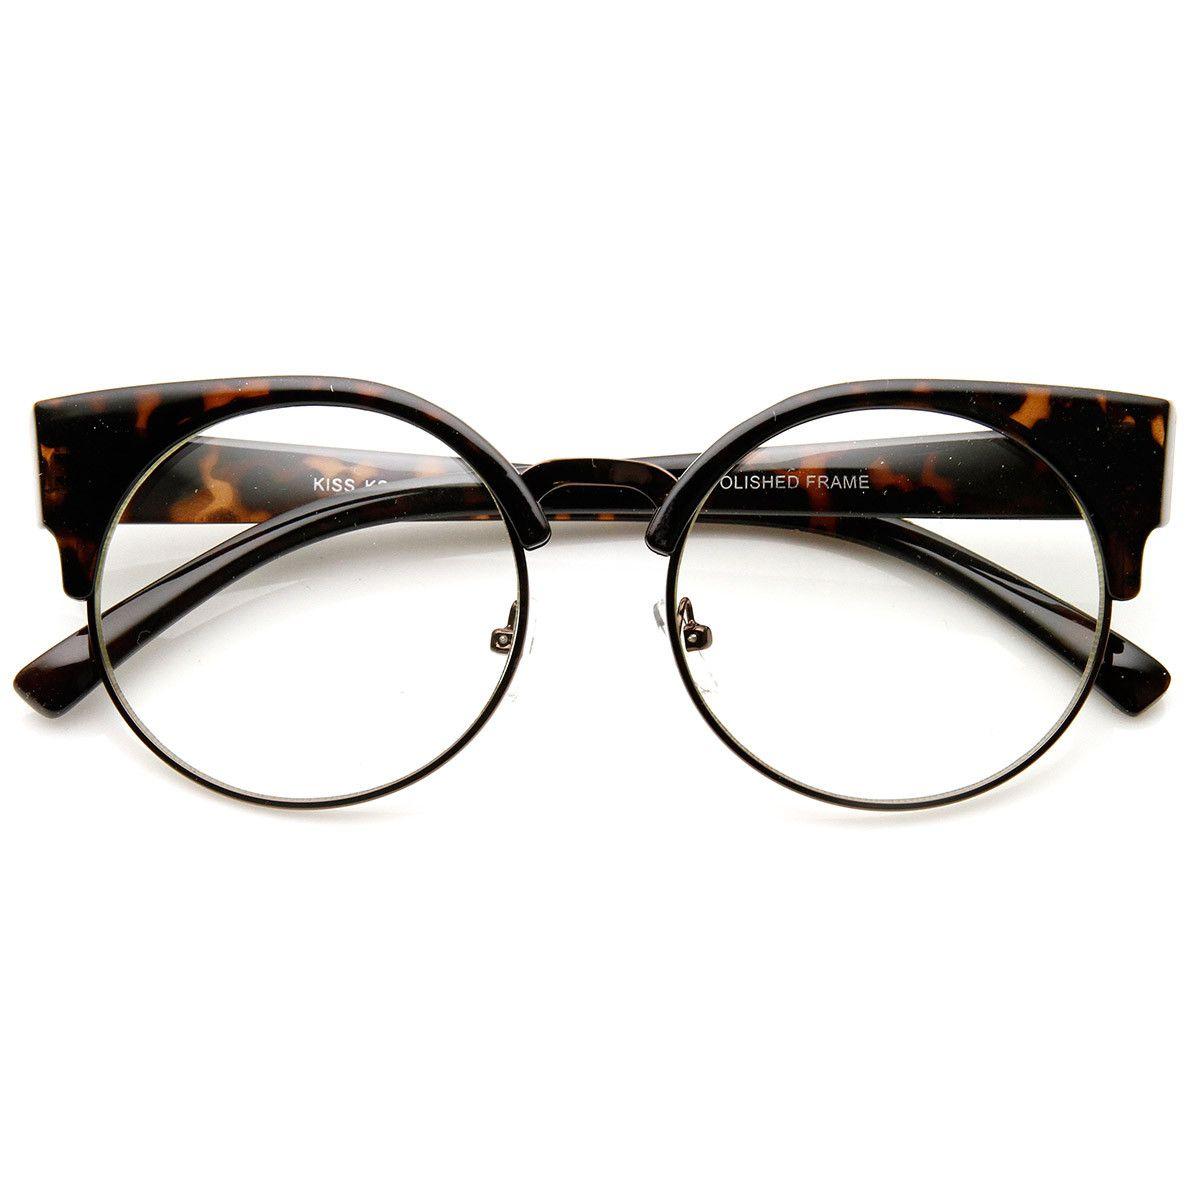 c38ceb816b5 Womens Half Frame Semi-Rimless Clear Lens Cat eye Round Glasses ...